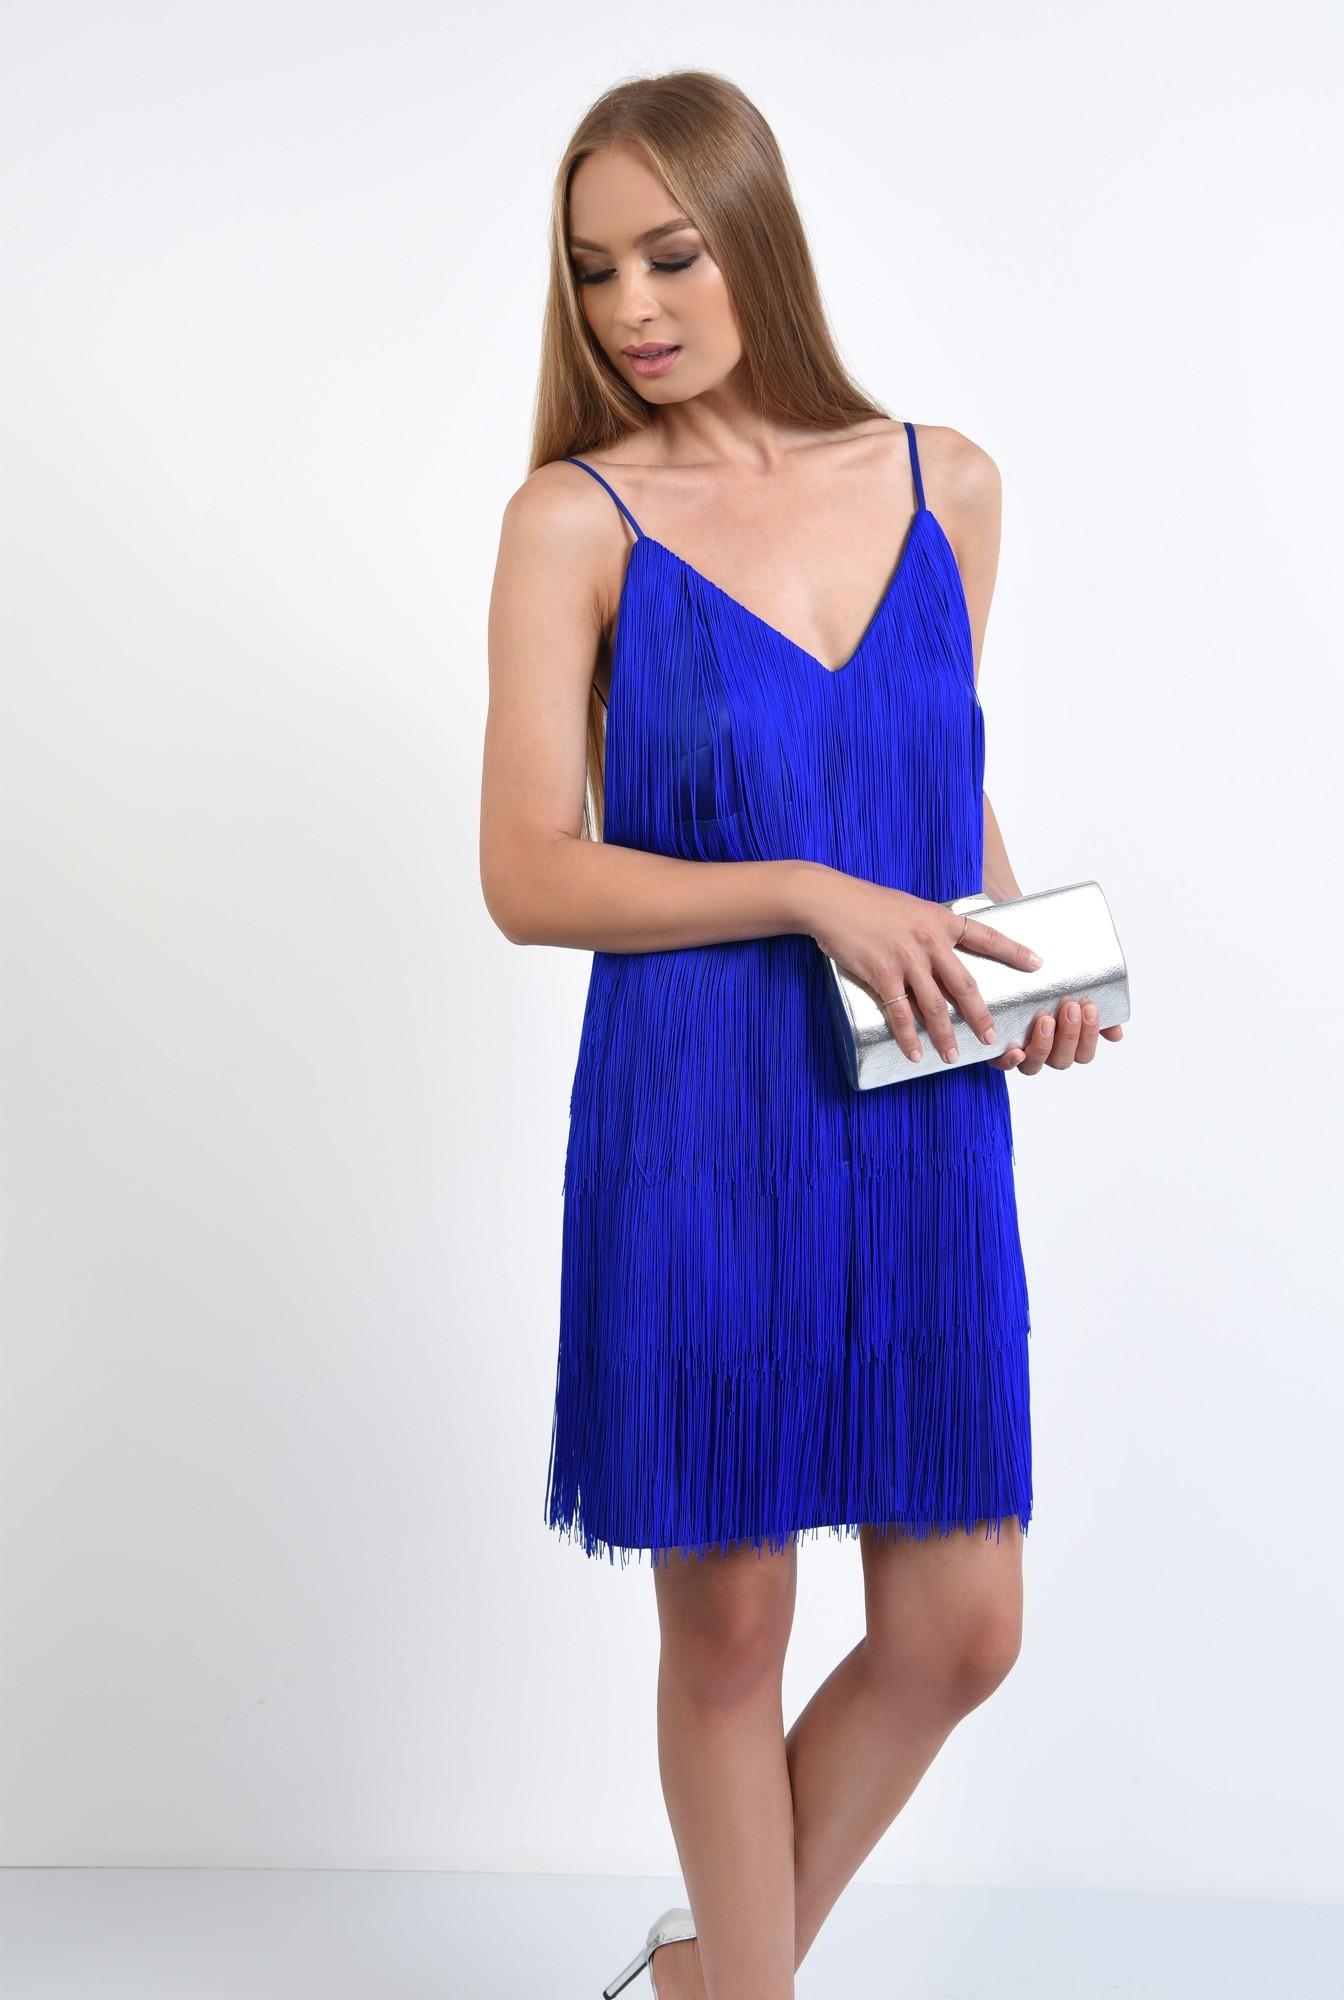 0 - 360 - rochie de seara albastra, cu frajuri, slip on, croi drept, anchior